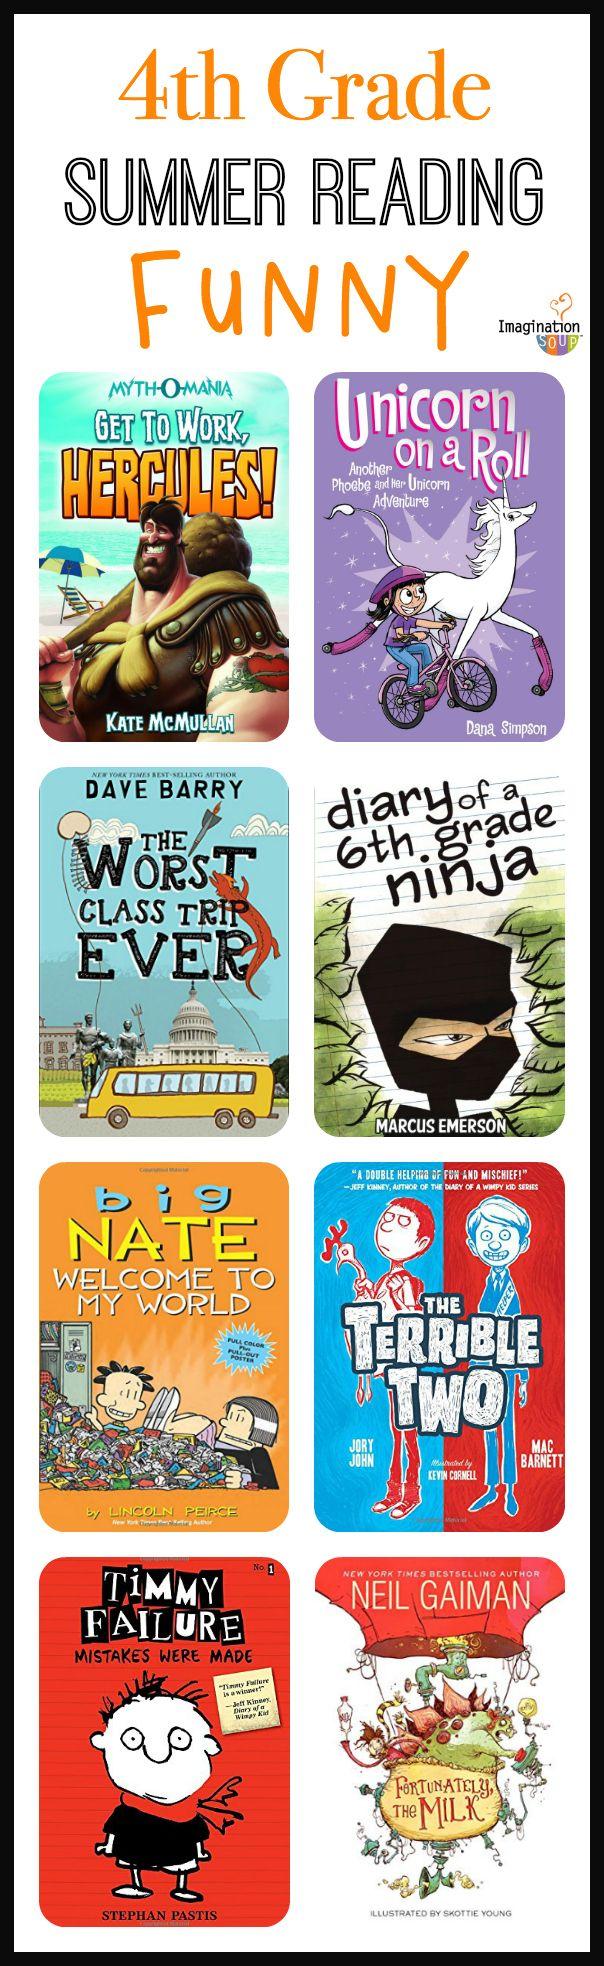 4th Grade Summer Reading List Ages 9 10 Summer Reading Summer Reading Lists 4th Grade Reading Books